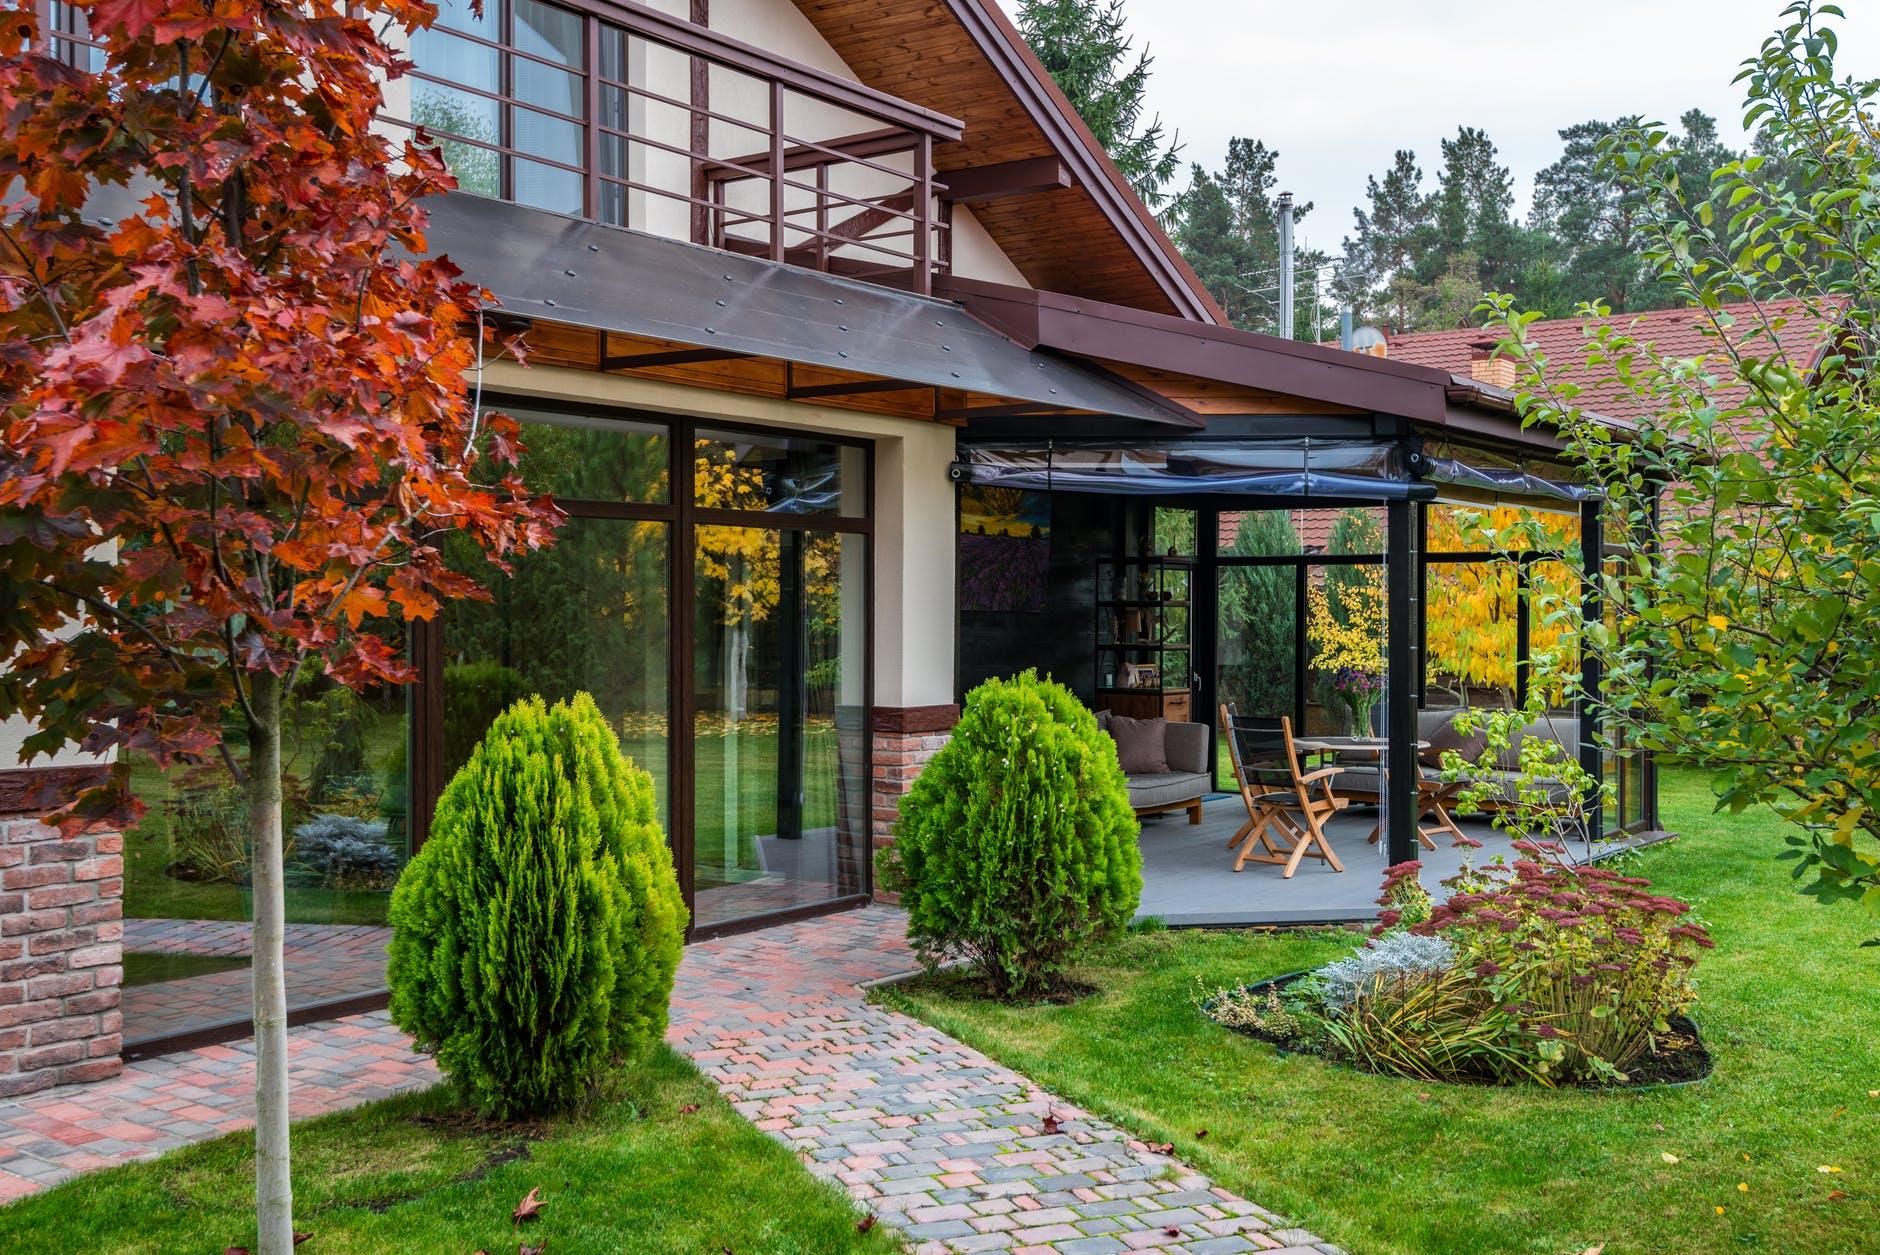 Principles of Landscaping Design